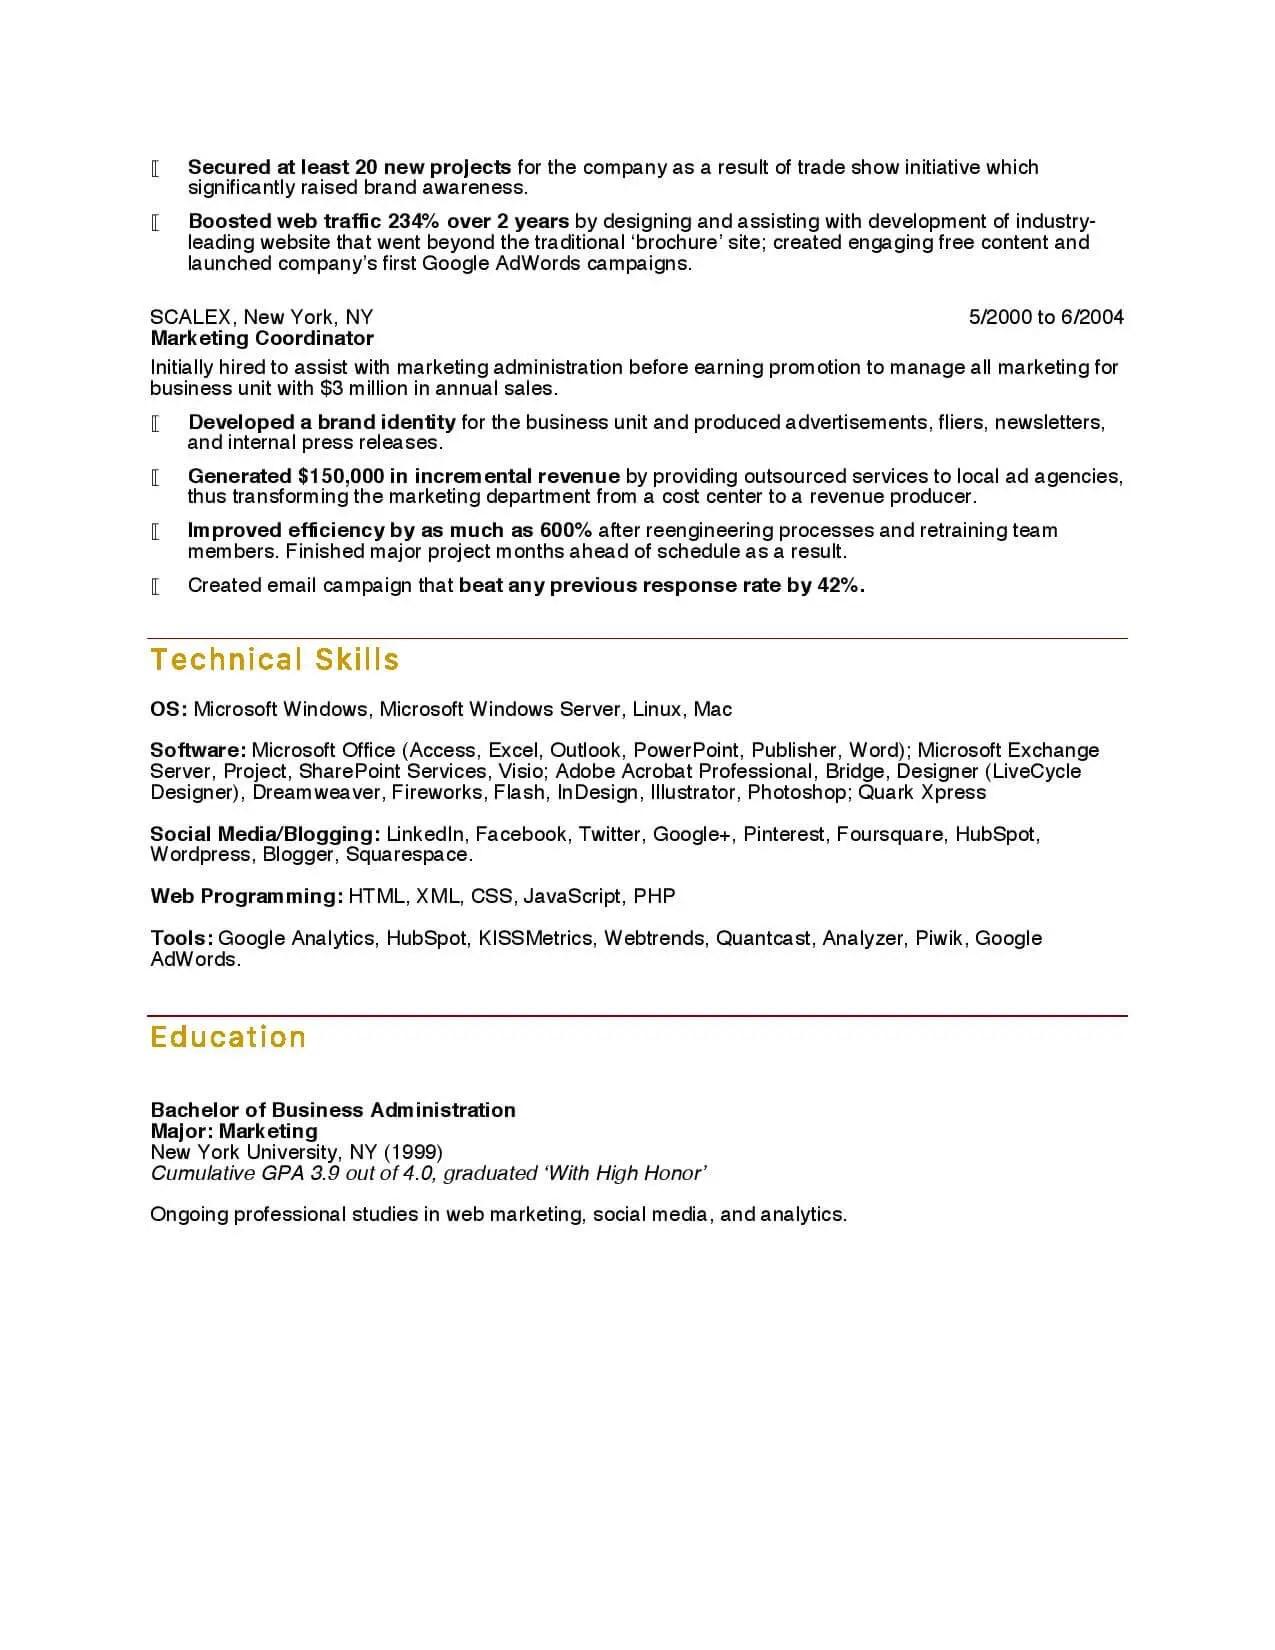 digital marketing specialist resume sample email letter spacing. Resume Example. Resume CV Cover Letter